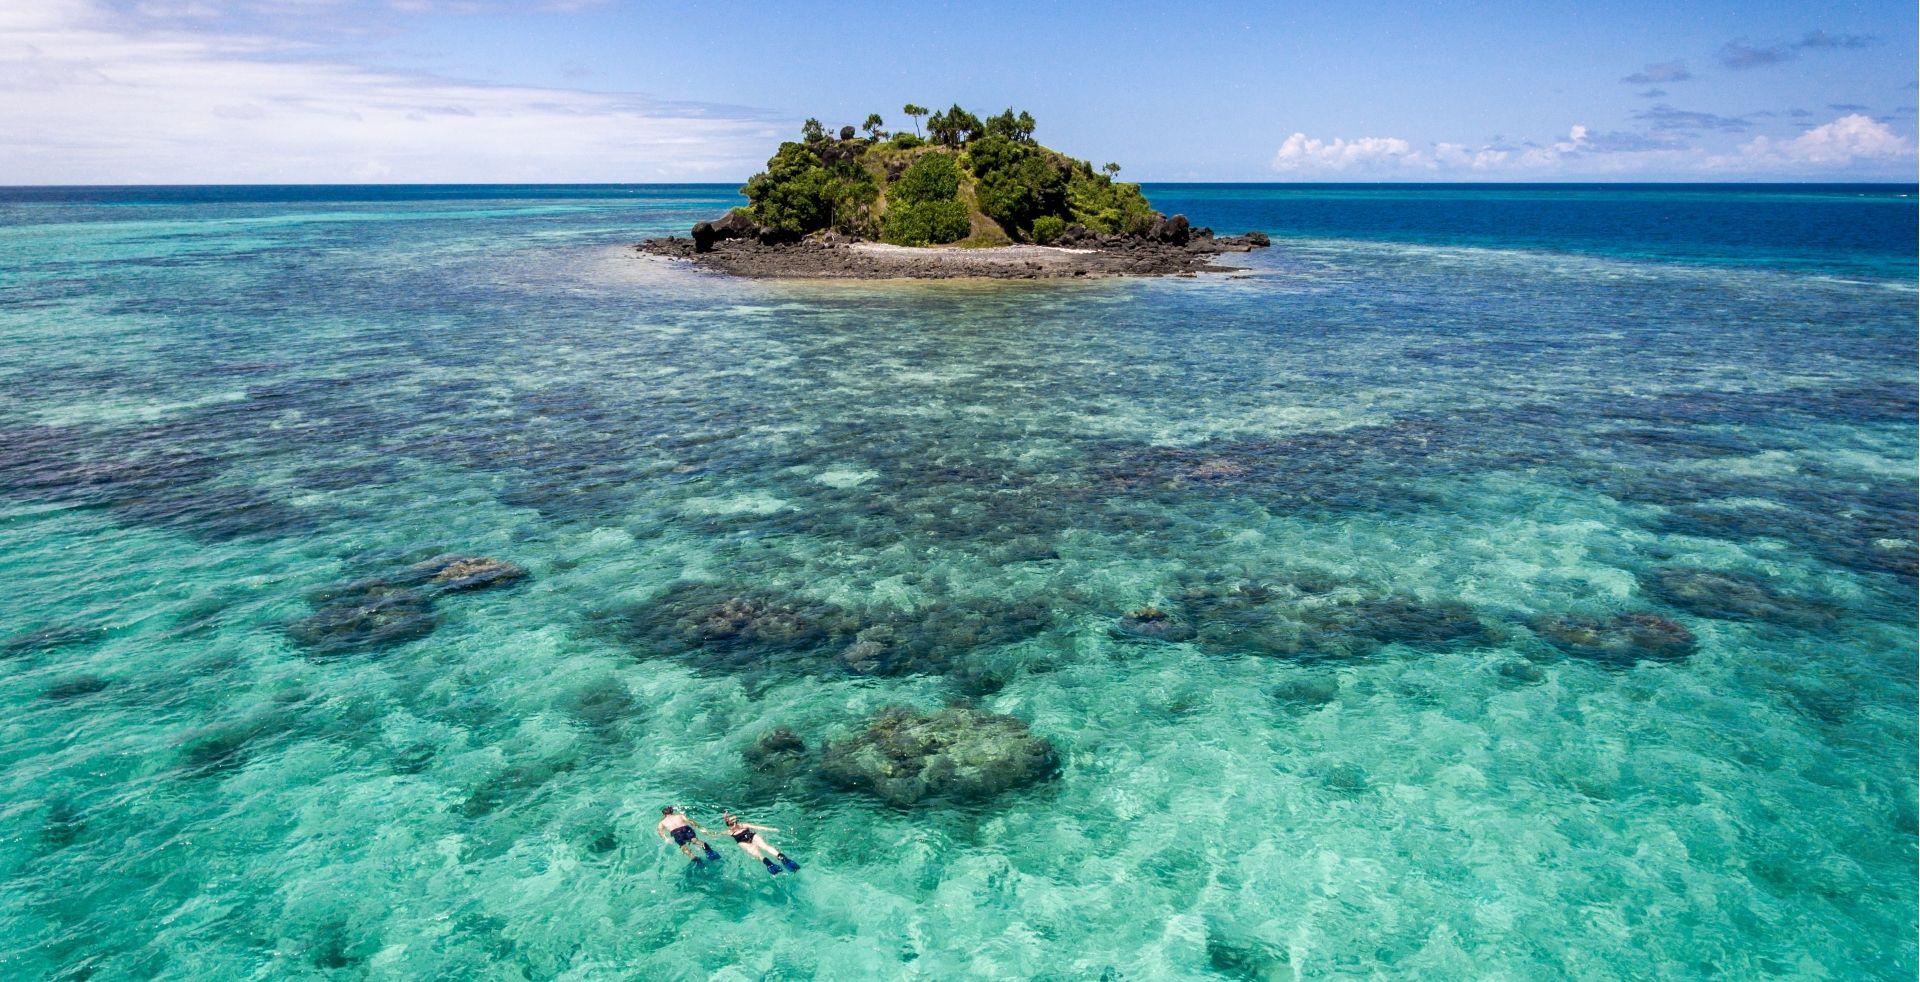 Snorkeling Fiji style